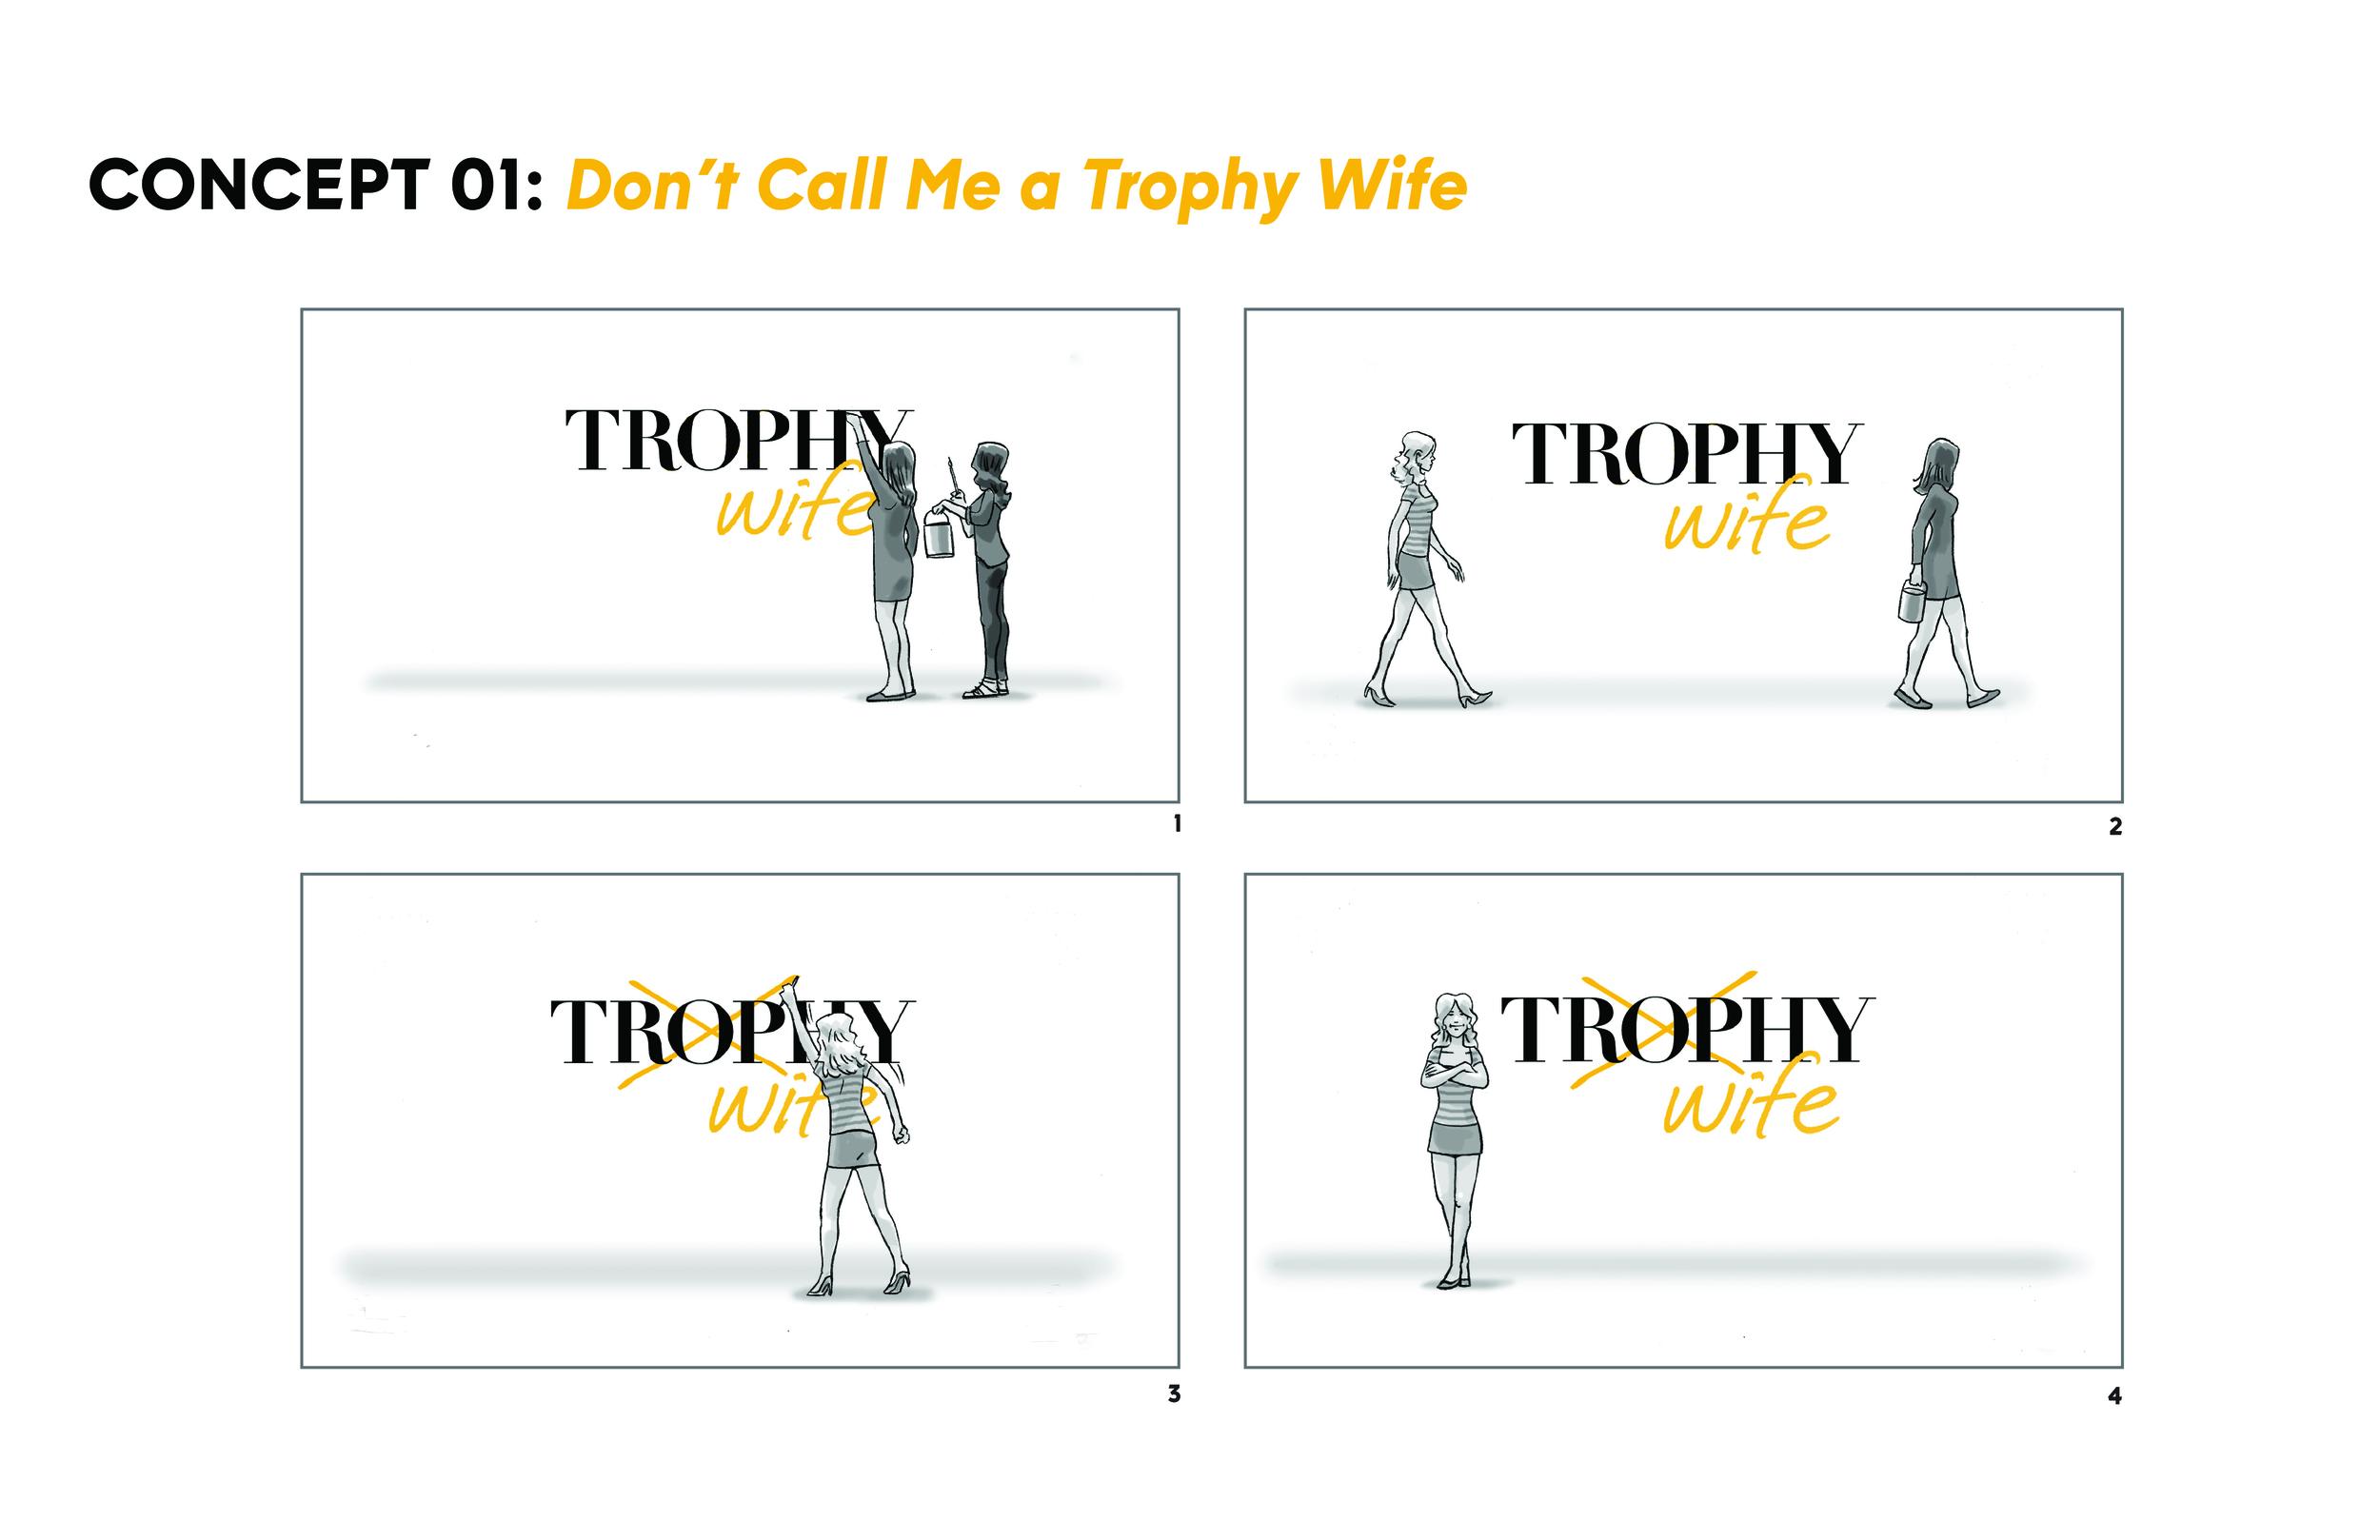 trophywife_concepts.jpg